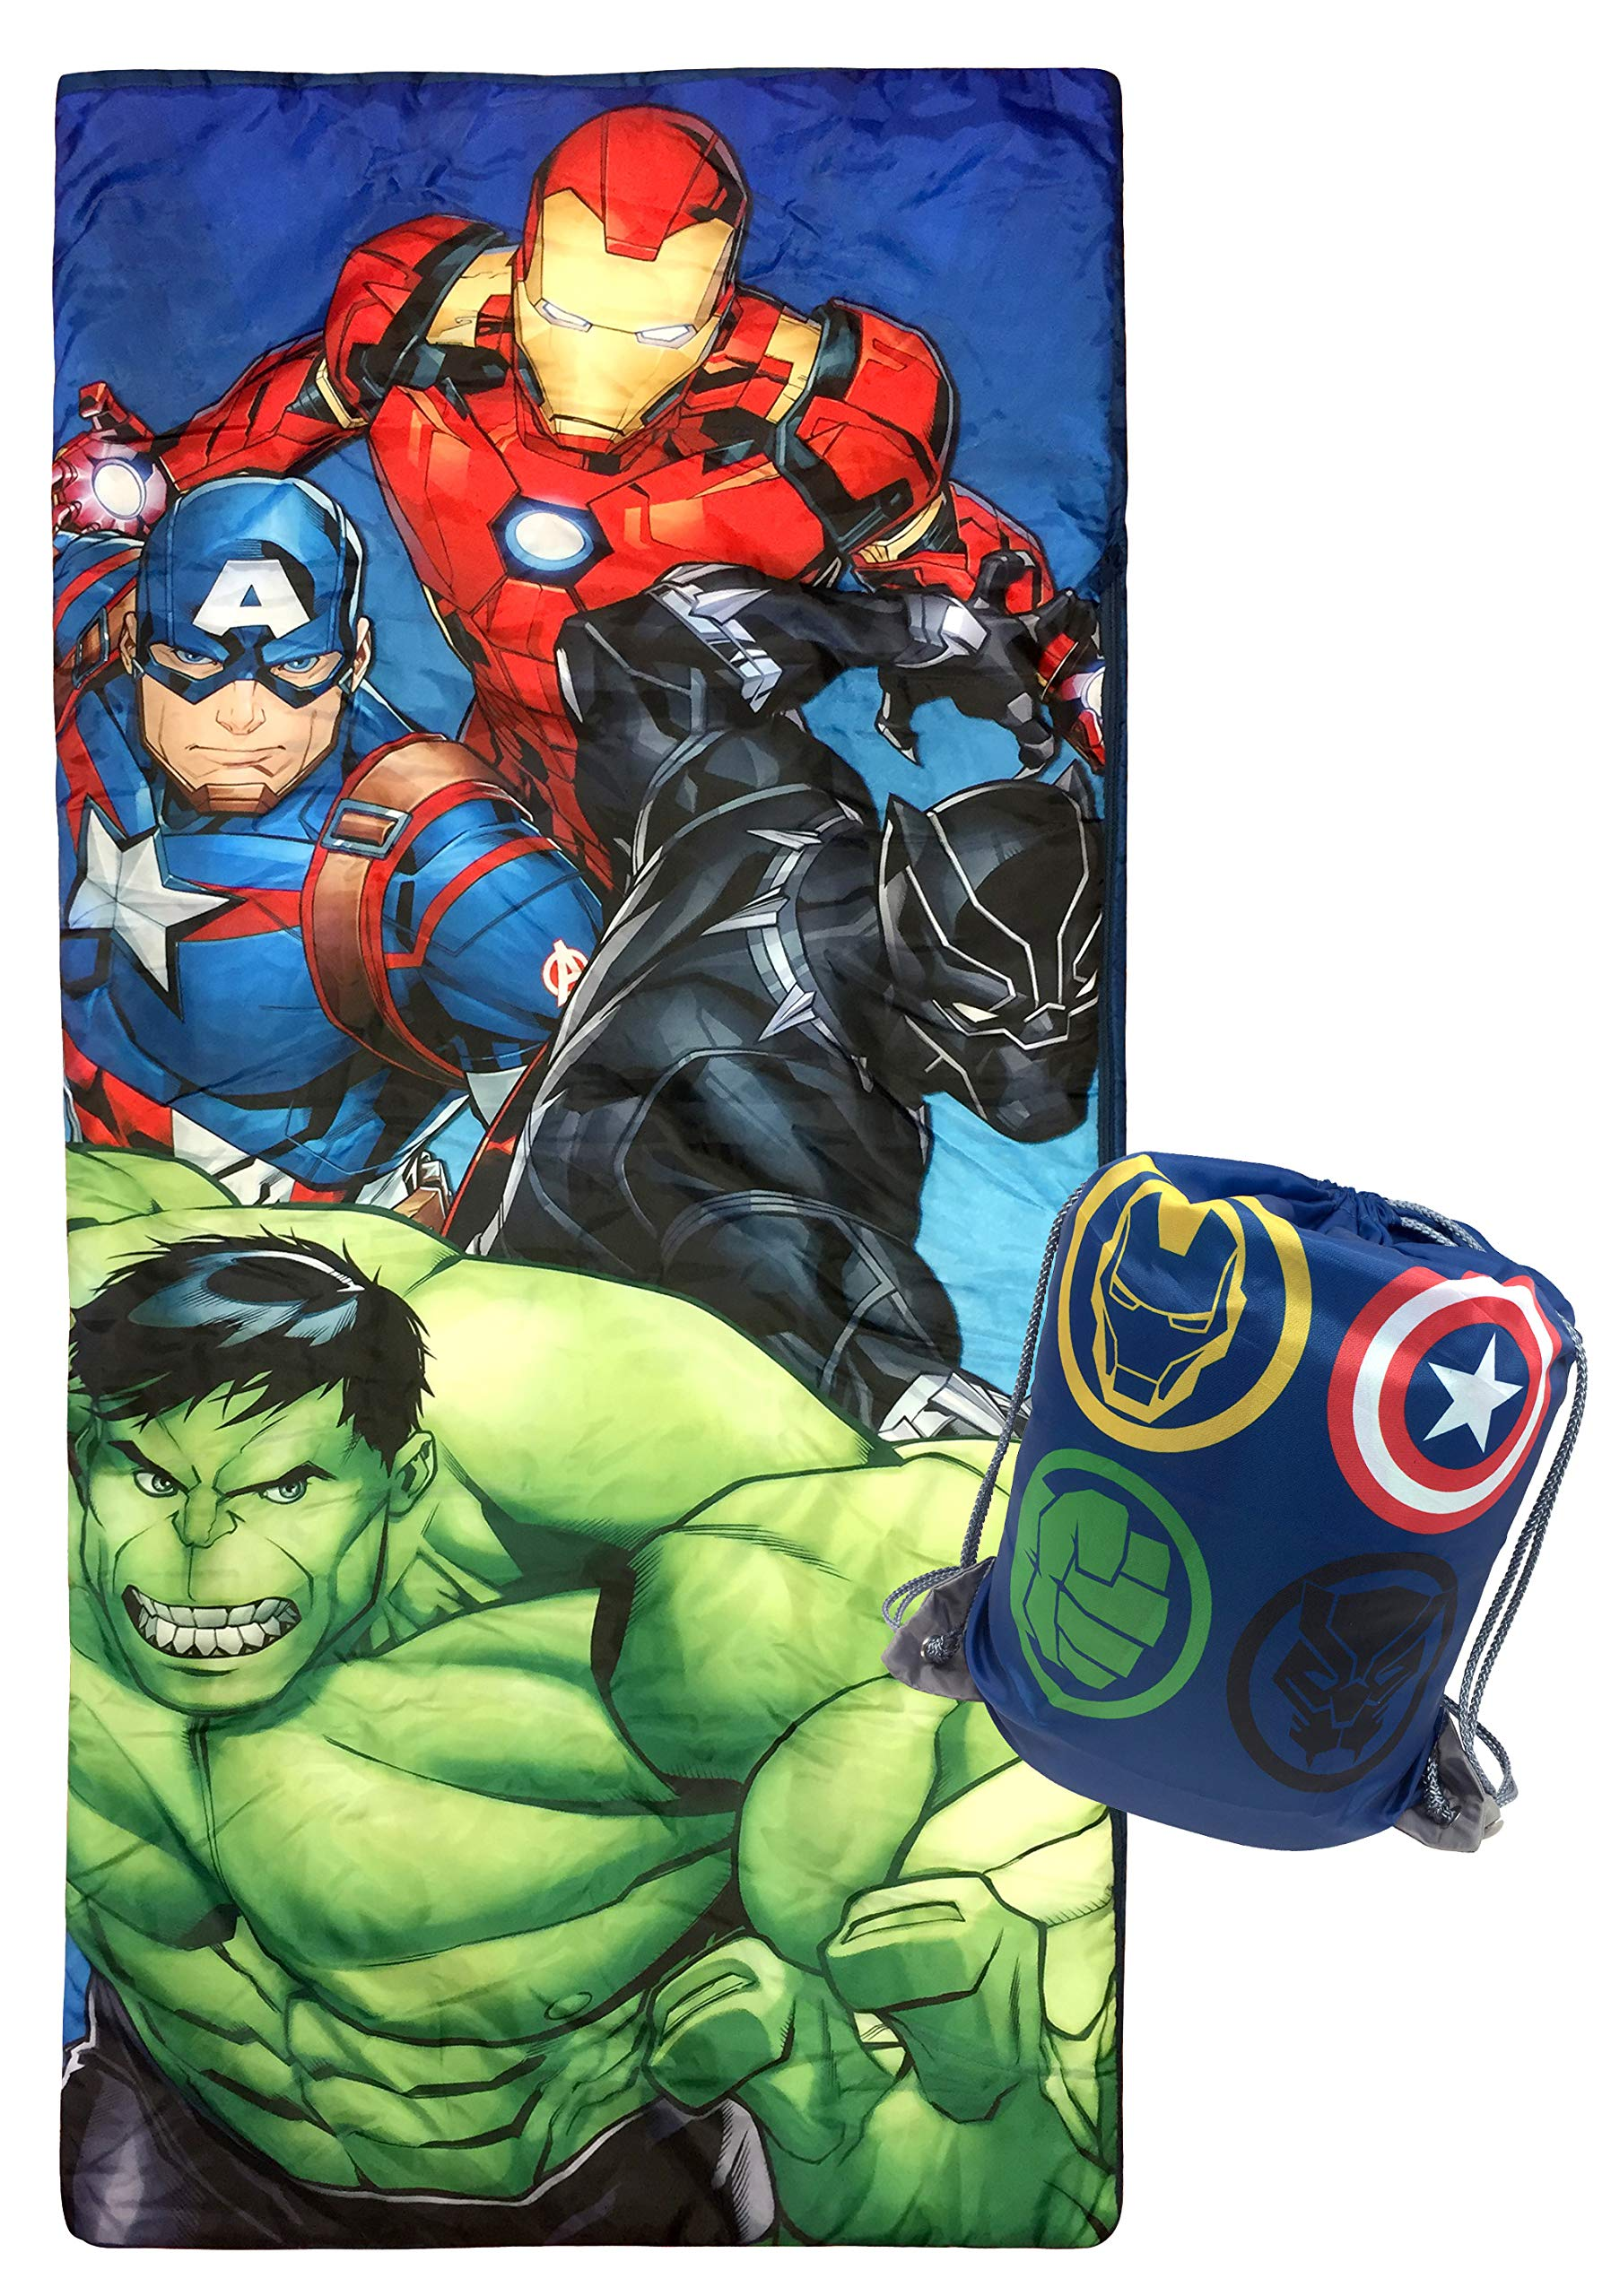 Jay Franco Marvel Avengers Battle Formation Slumber Sack - Cozy & Warm Kids Lightweight Slumber Bag/Sleeping Bag - Featuring Captain America, Iron Man, Black Panther, Hulk (Official Marvel Product) by Jay Franco